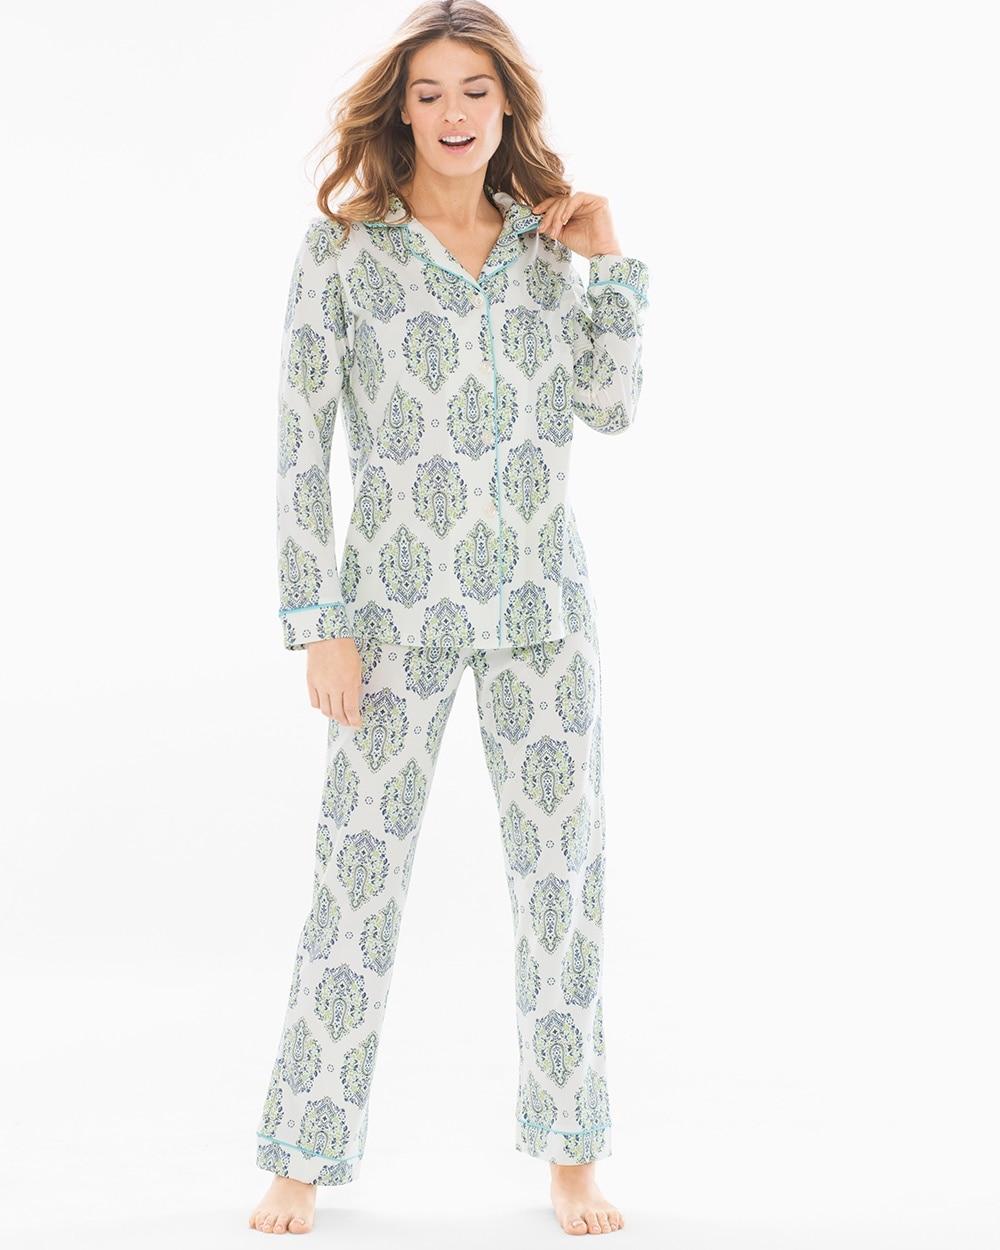 958c4af654 BedHead Knit Cotton-Blend Pajama Set Blue And Green Casa Paisley